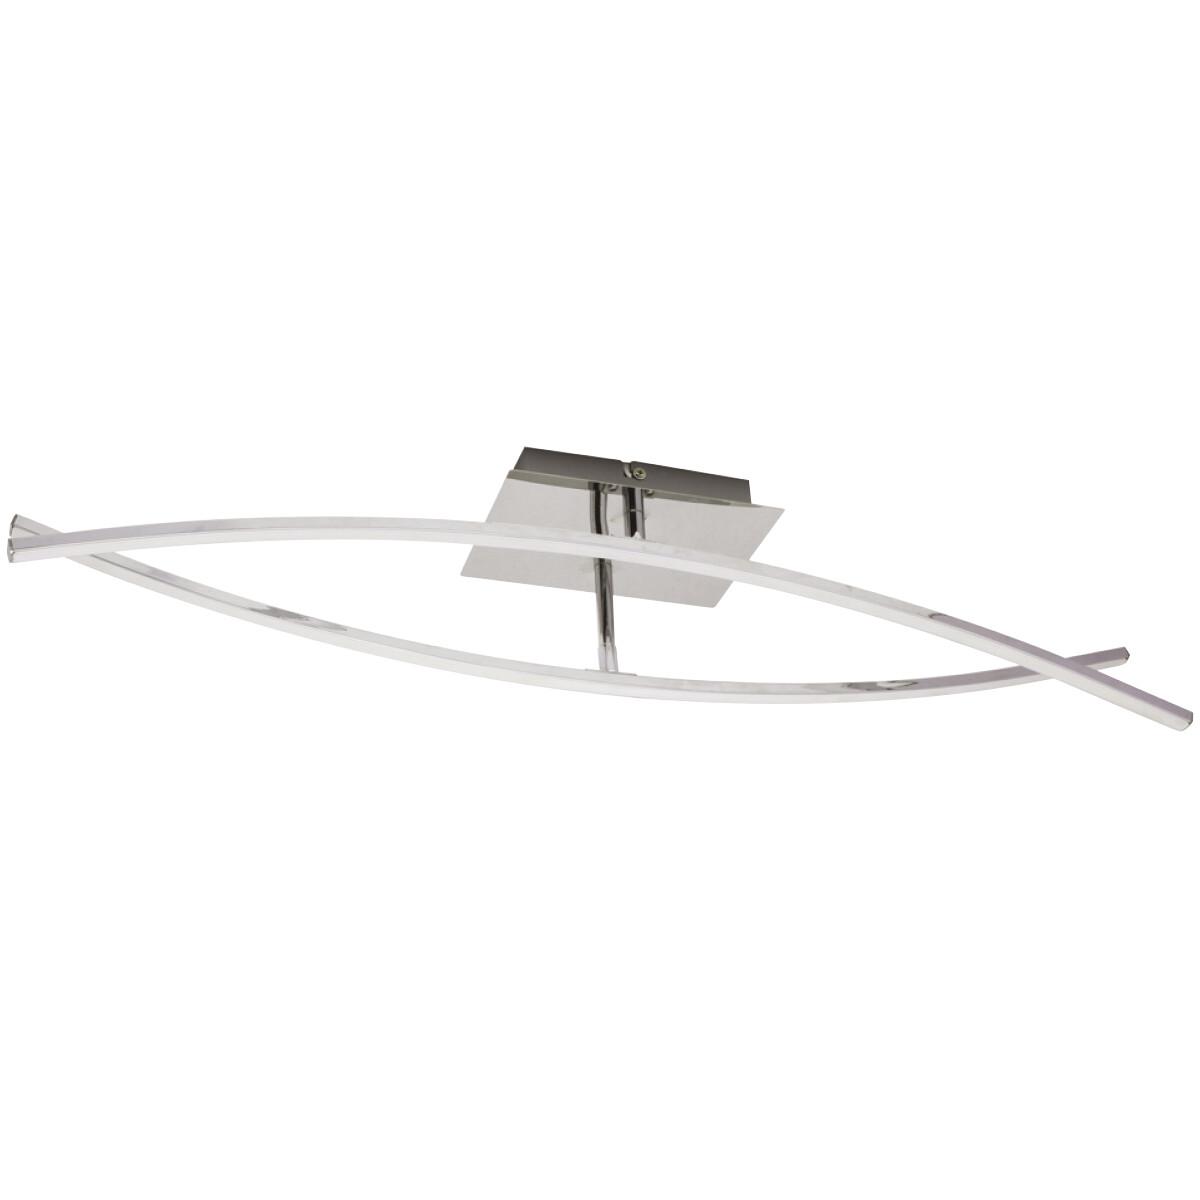 LED Plafondlamp - Plafondverlichting - Onamo - 16W - Natuurlijk Wit 4000K - Mat Chroom - Aluminium